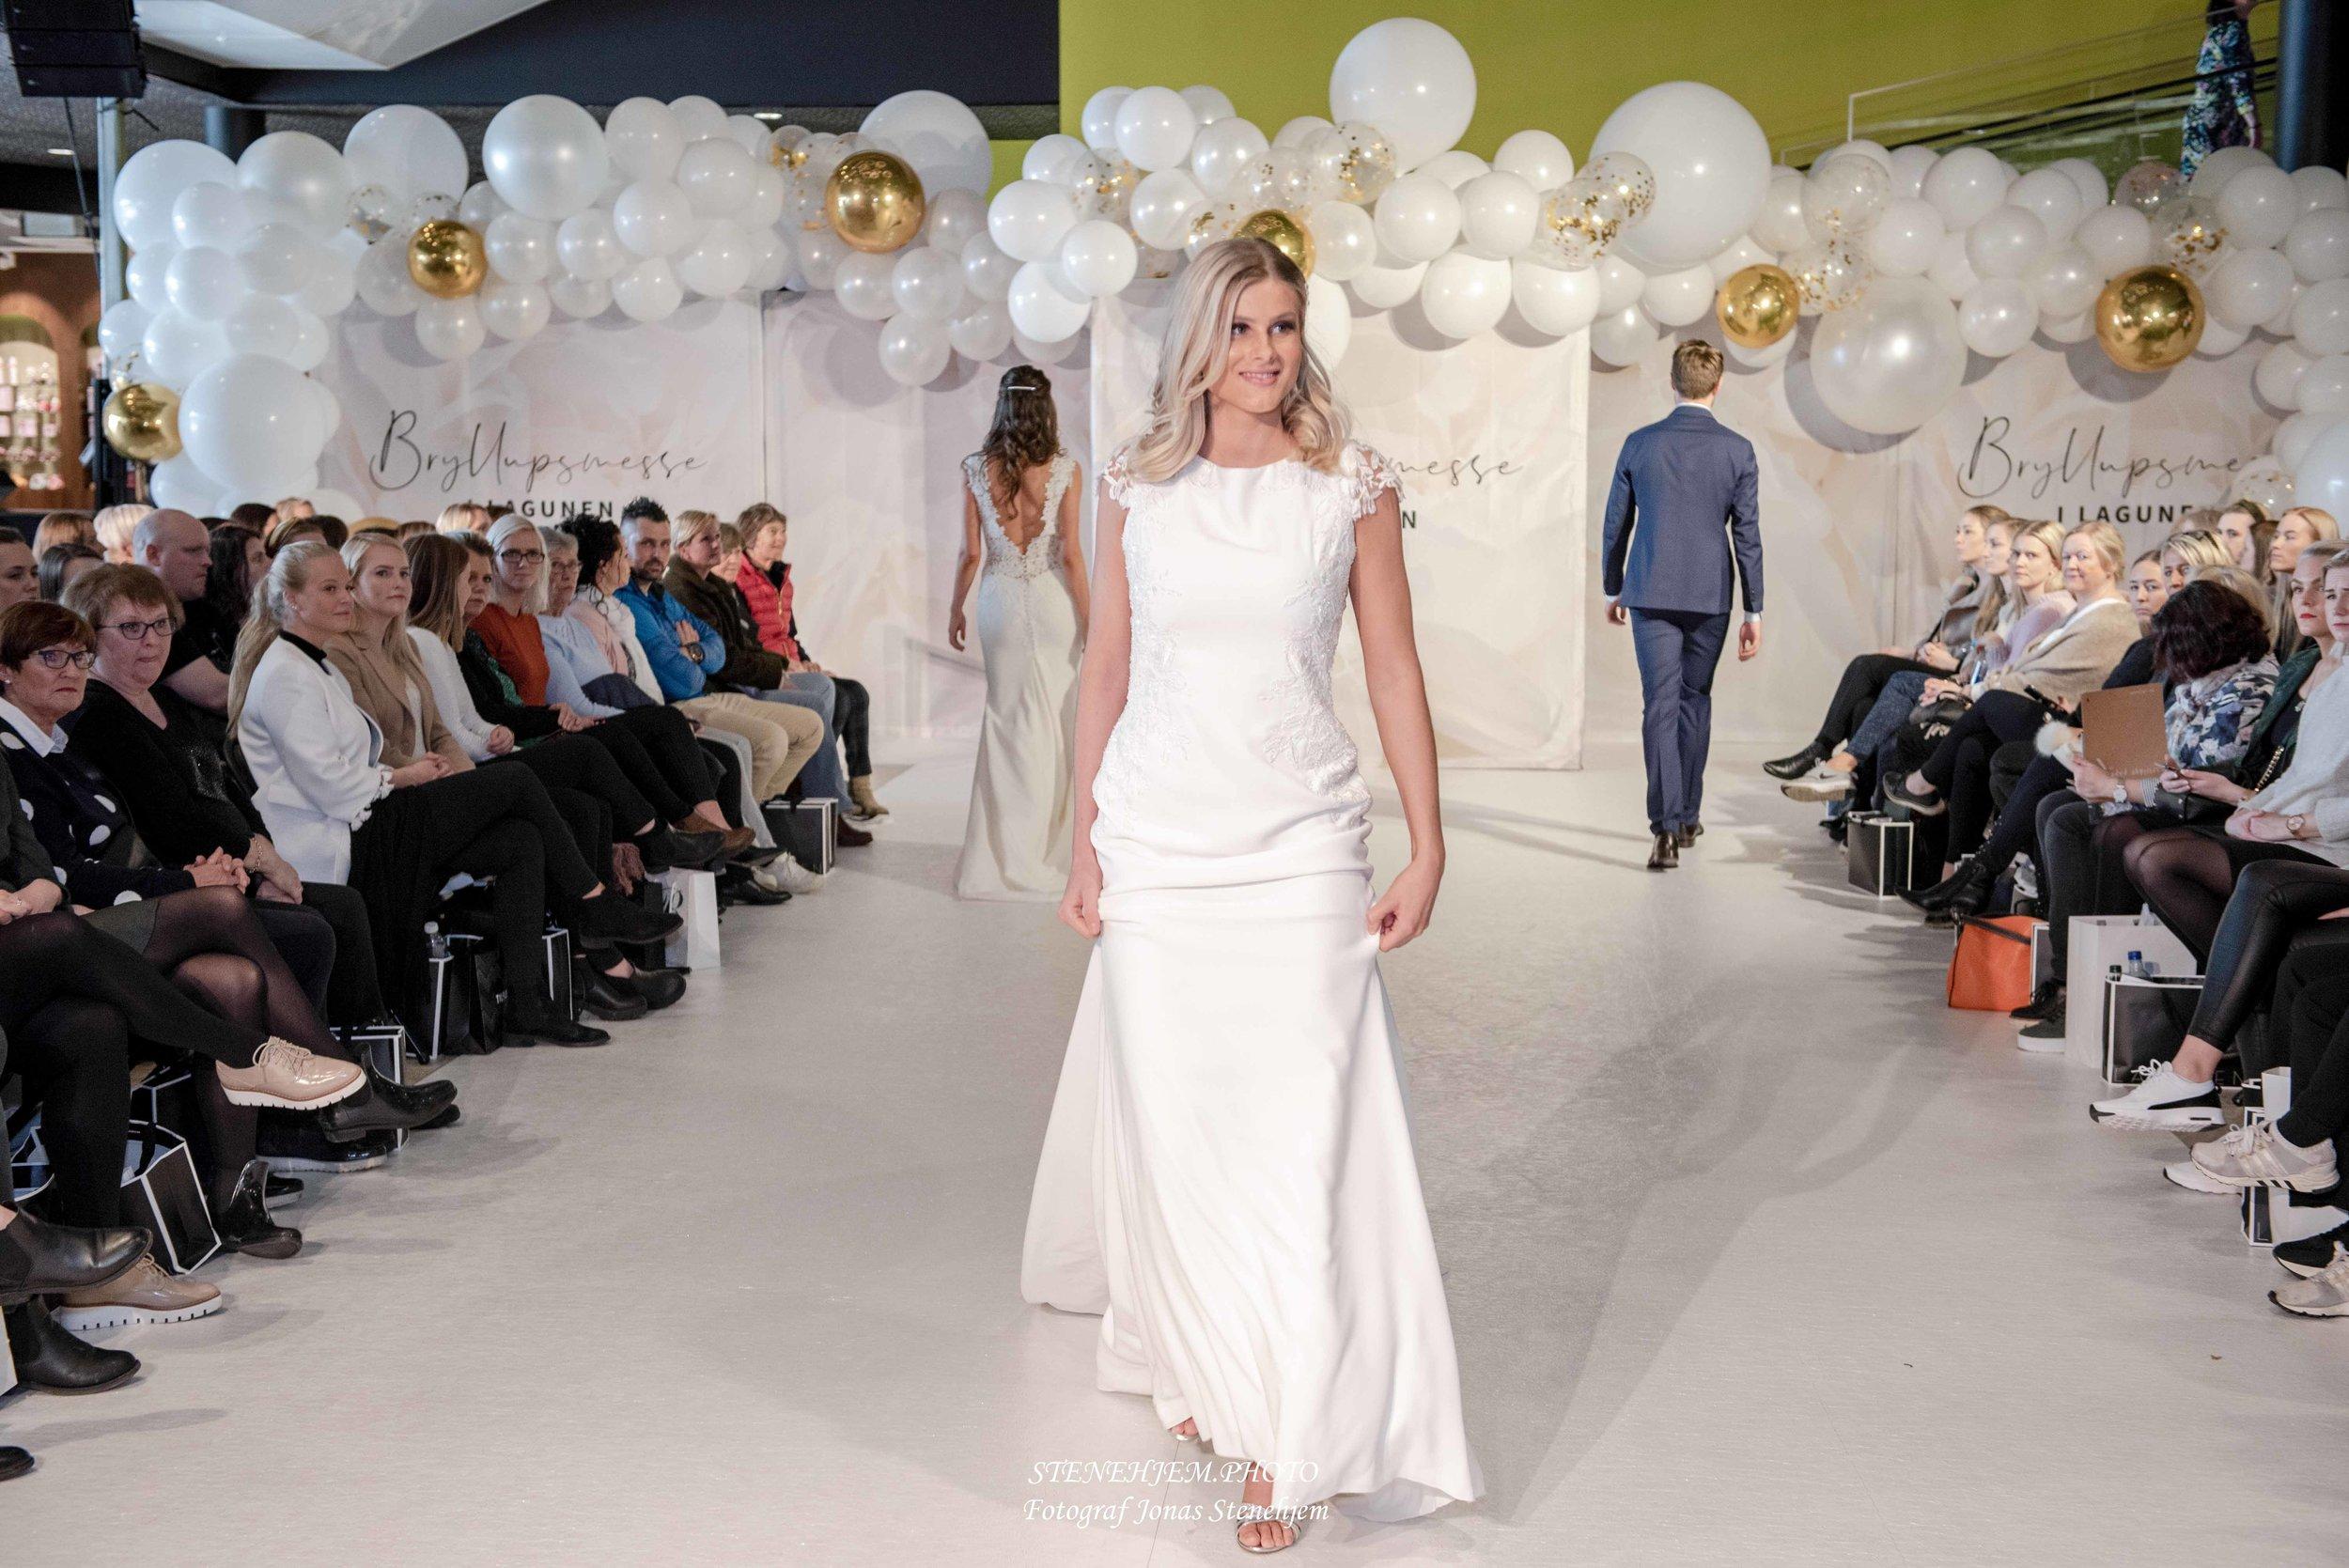 Bryllupsmesse_Lagunen_mittaltweddingfair__074.jpg